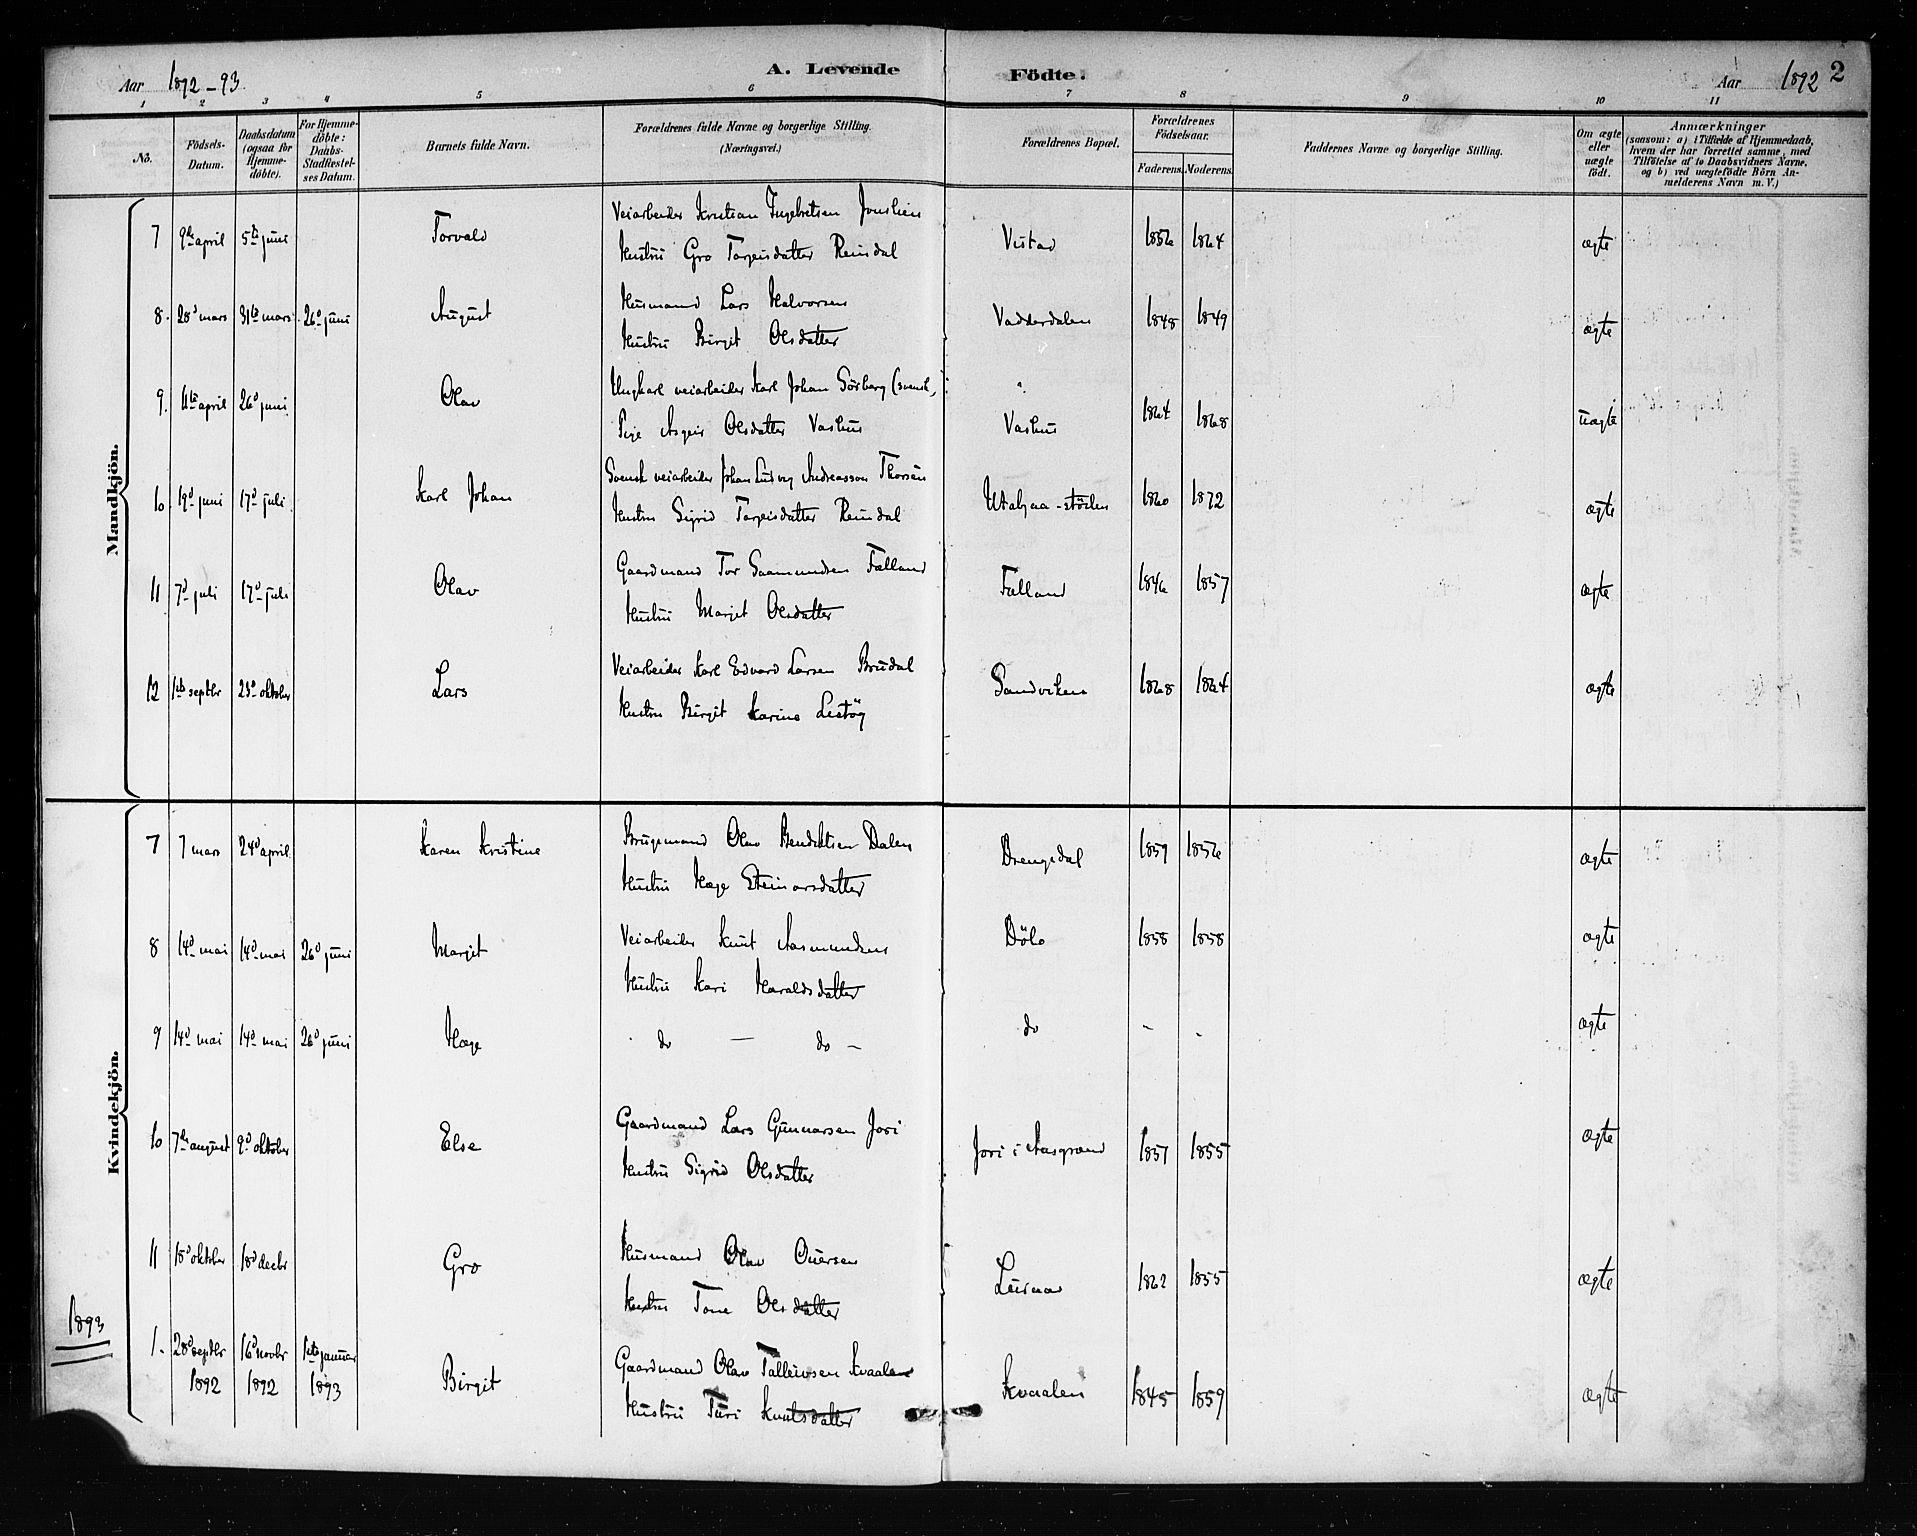 SAKO, Mo kirkebøker, G/Ga/L0002: Klokkerbok nr. I 2, 1892-1914, s. 2